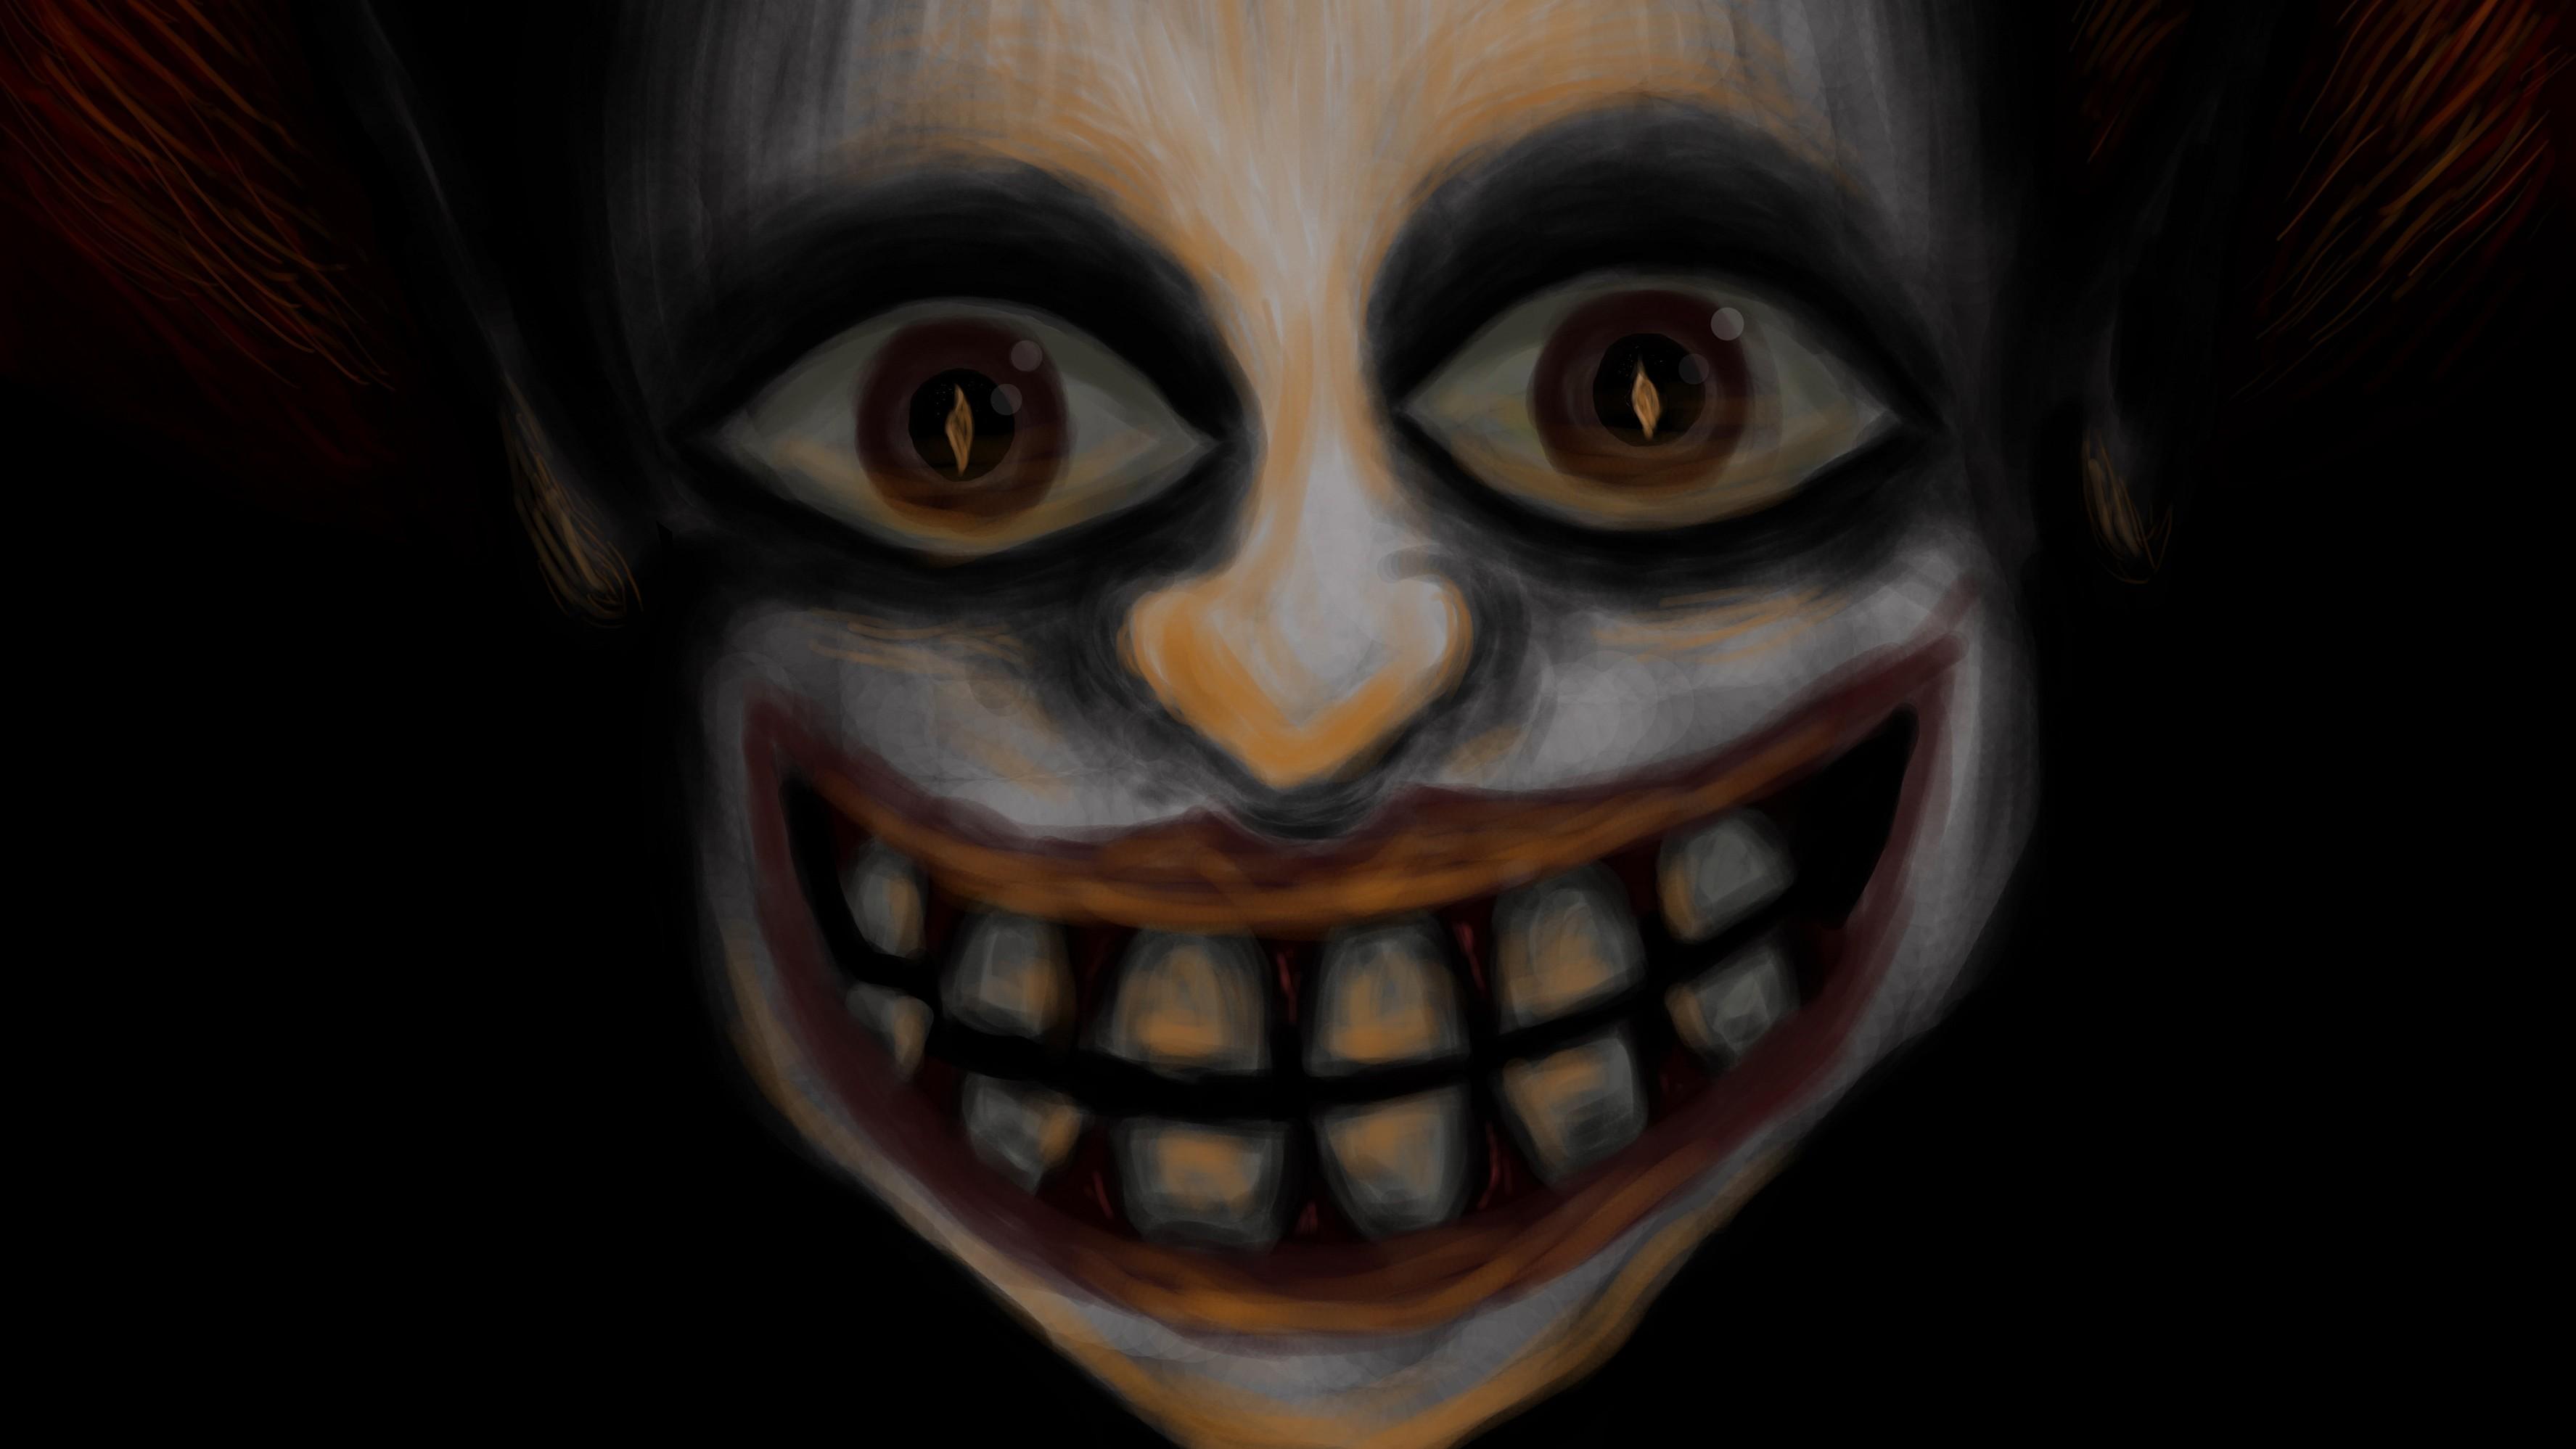 Res: 3550x1997, HD Wallpaper | Background Image ID:564627.  Dark Creepy